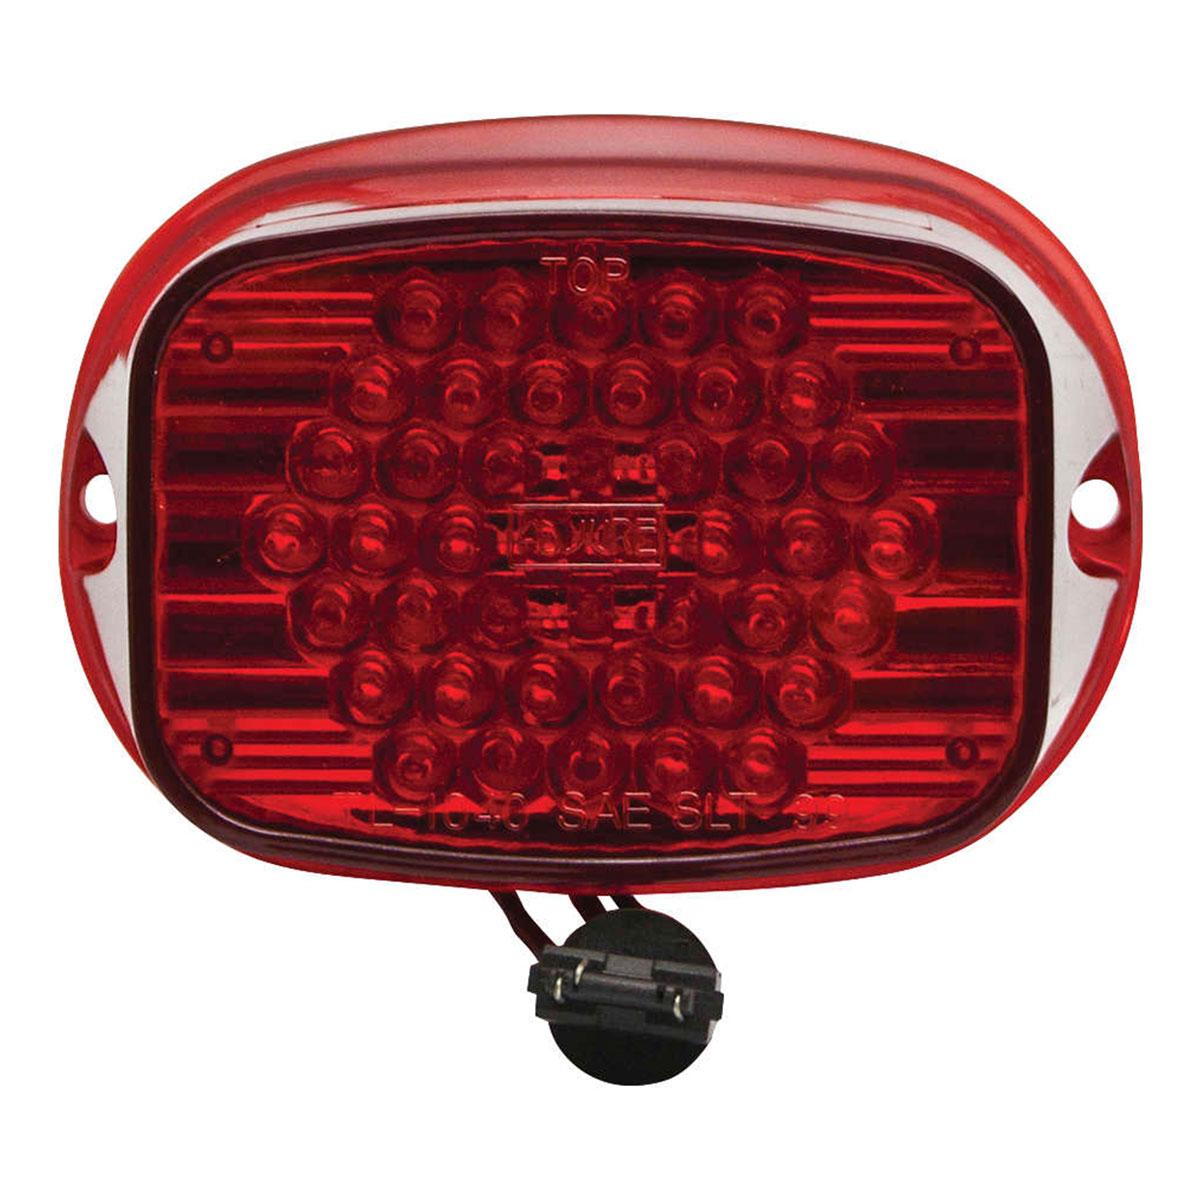 Adjure LED Taillight Assembly